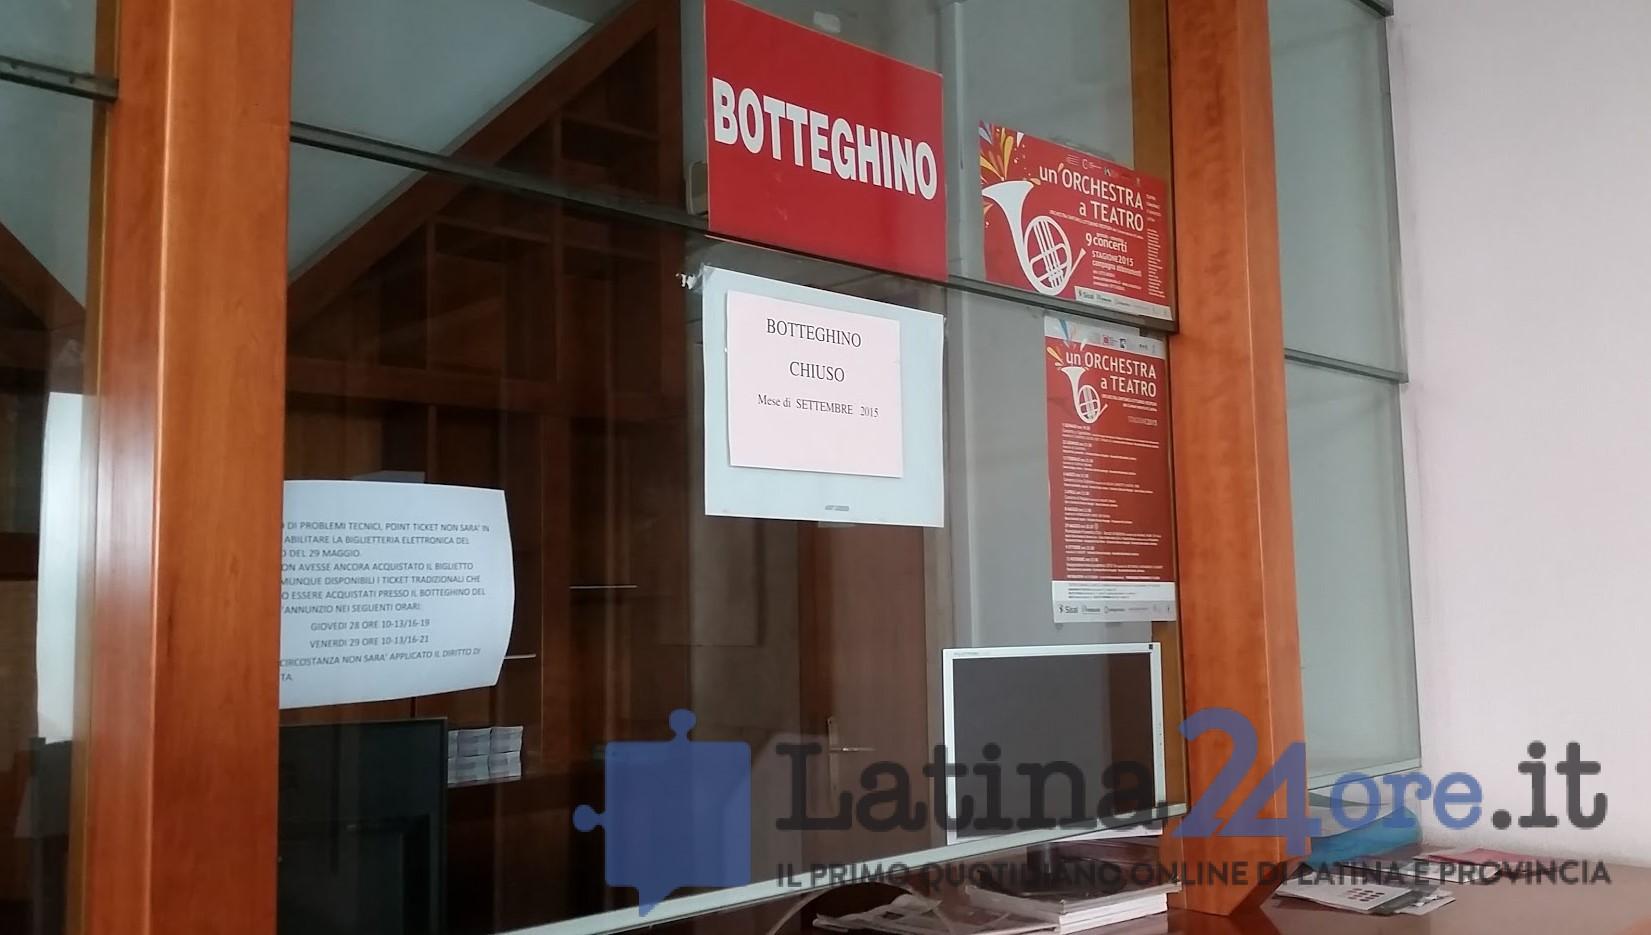 teatro-latina-botteghino-chiuso